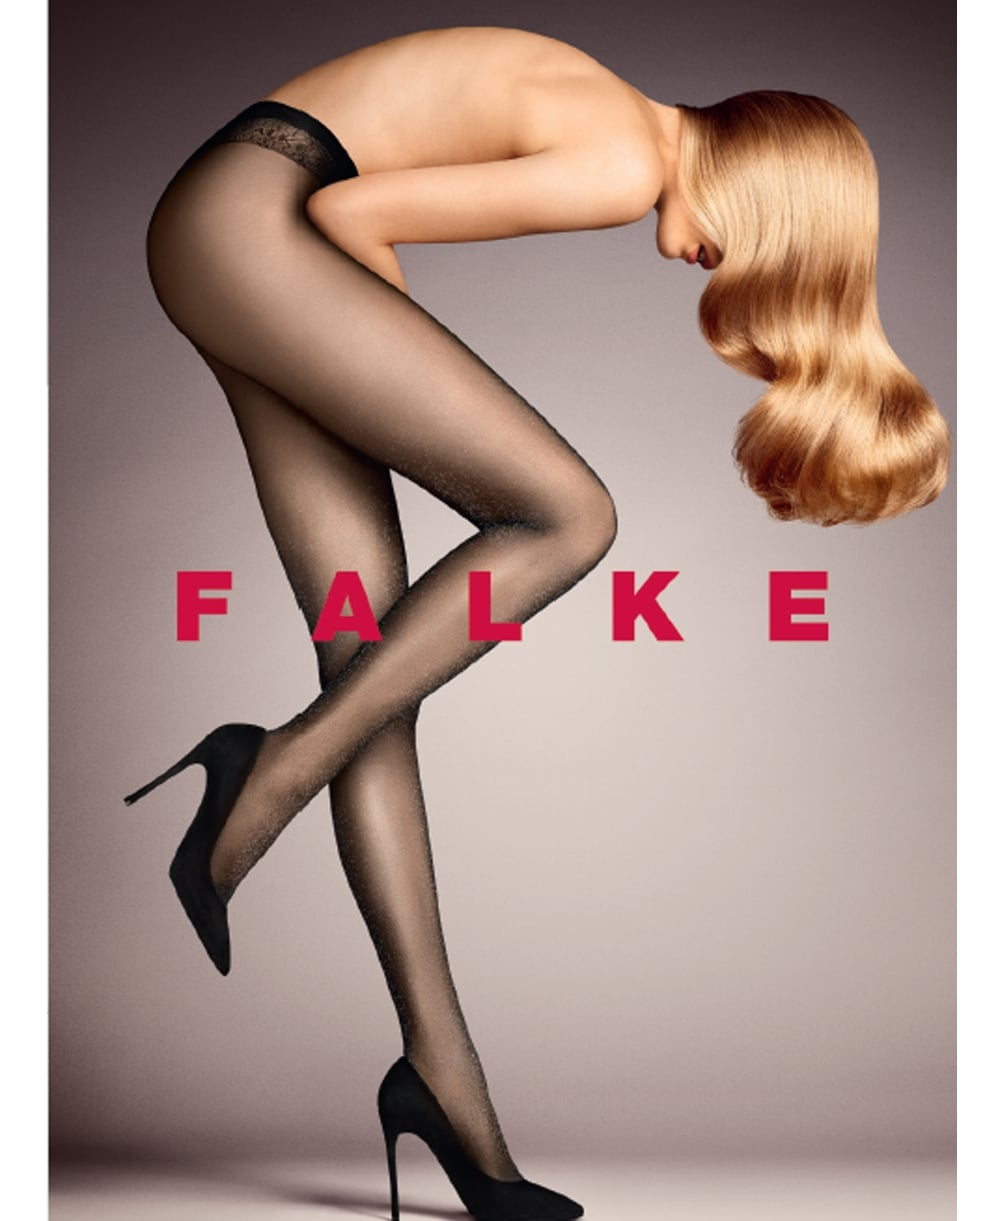 Medias de mujer: Falke